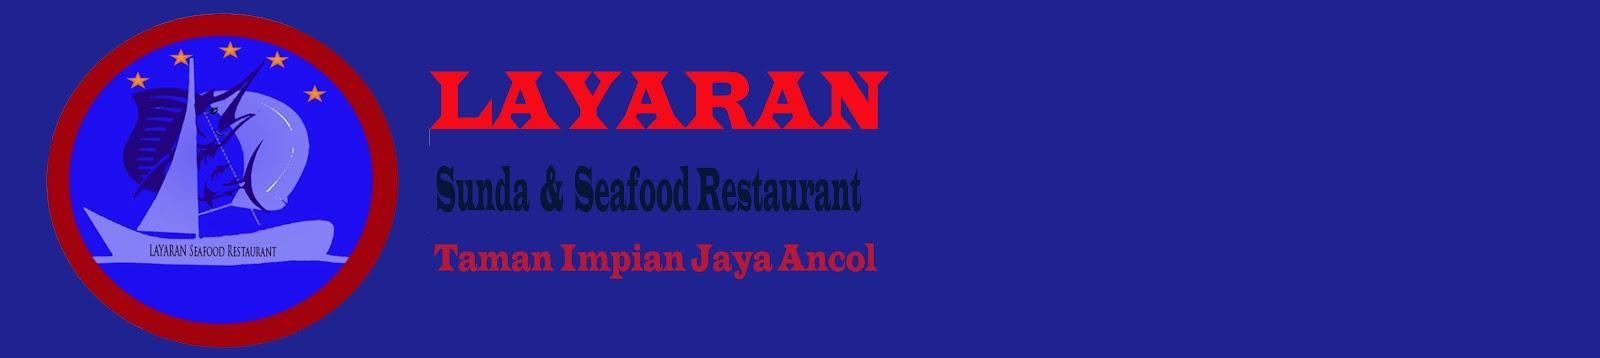 LAYARAN Sunda N' Seafood Restaurant